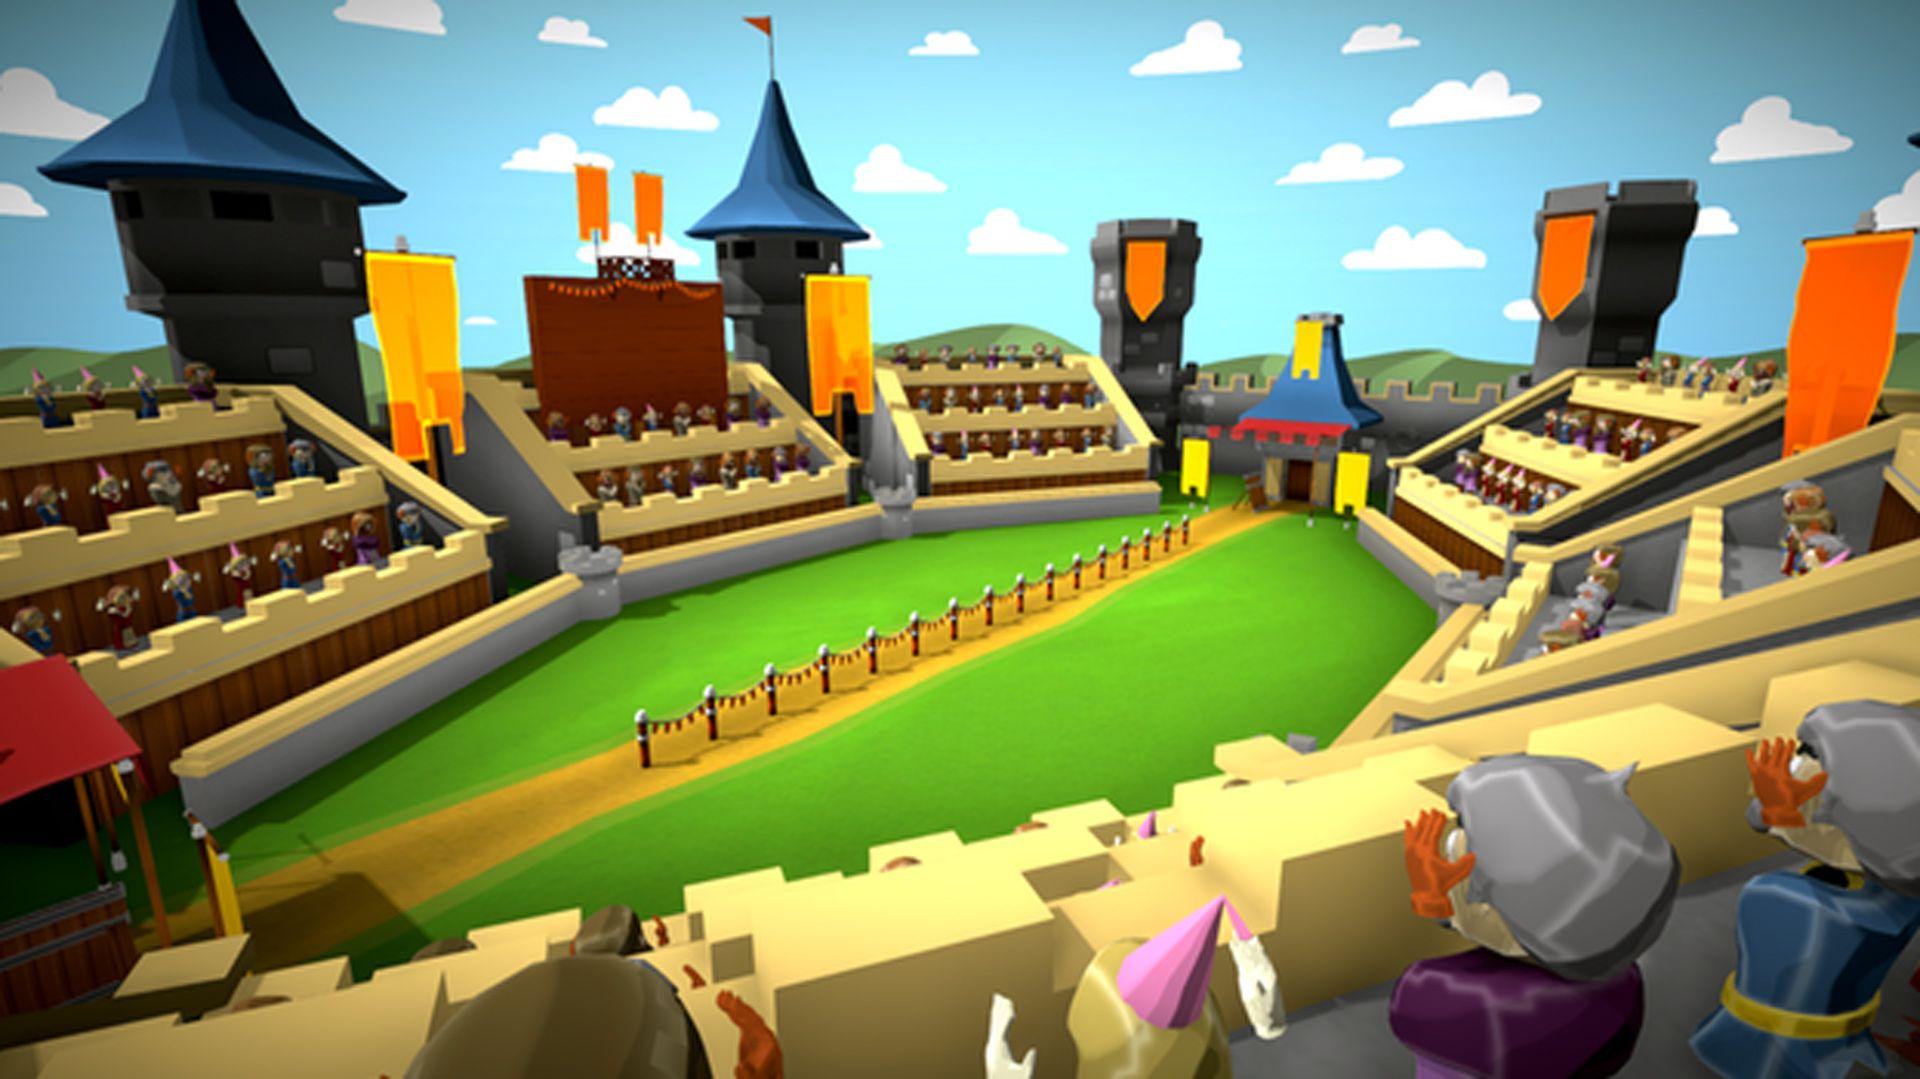 Studio Behind Prison Boss VR Launches Kickstarter for VR